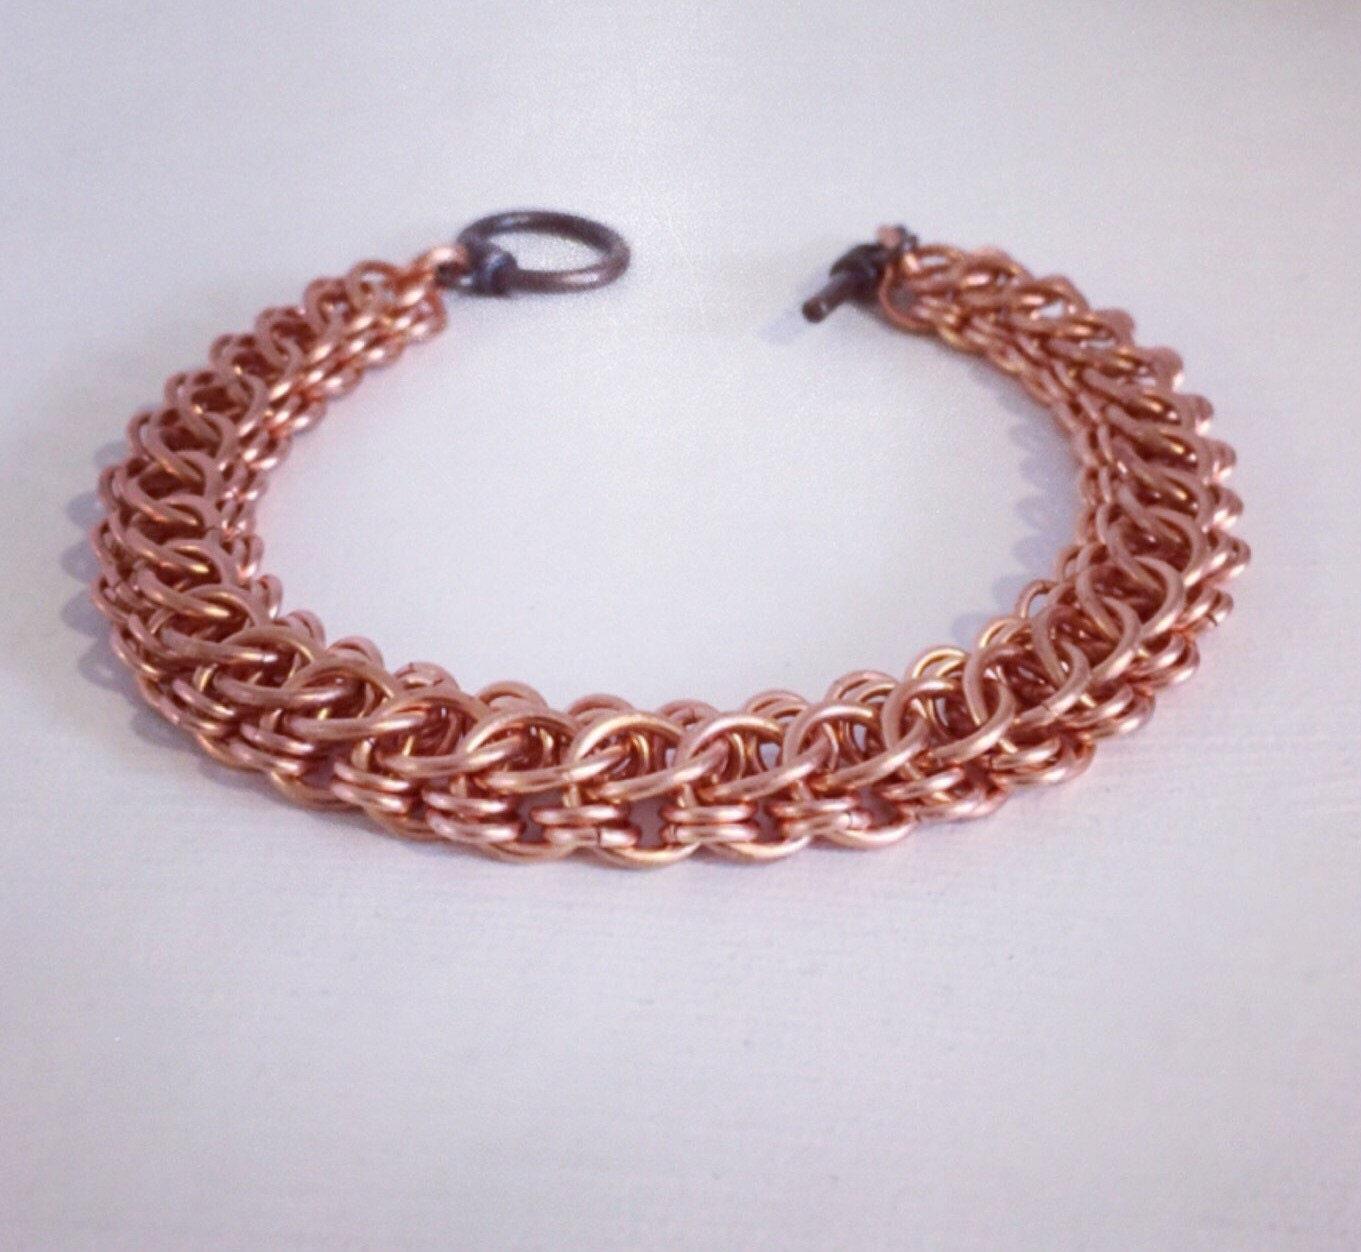 copper bracelet chainmaille chain link bracelet mens